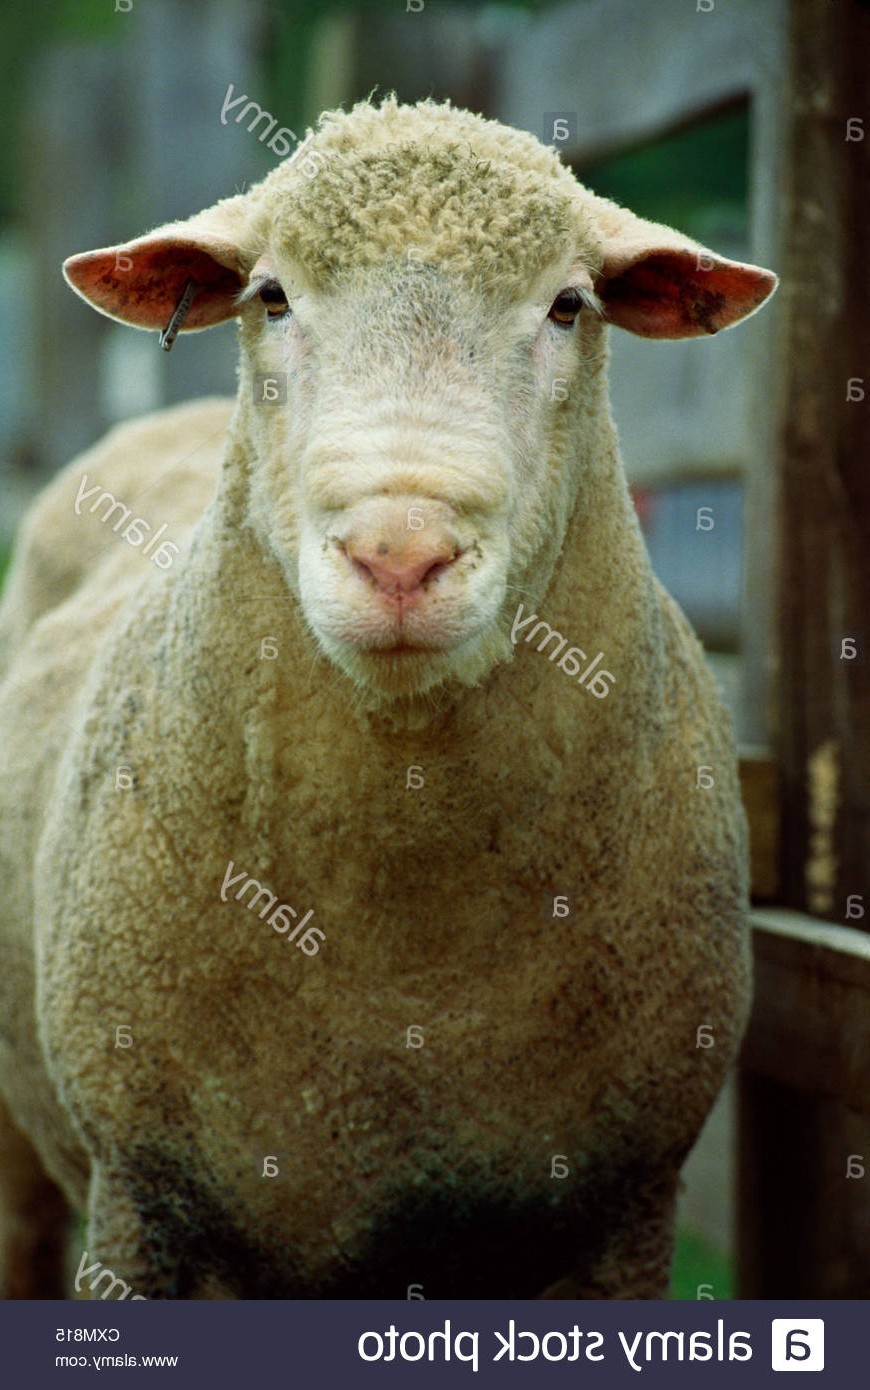 Champion Dorset Ram Stock Photo   Alamy intended for Gambar Domba Dorset